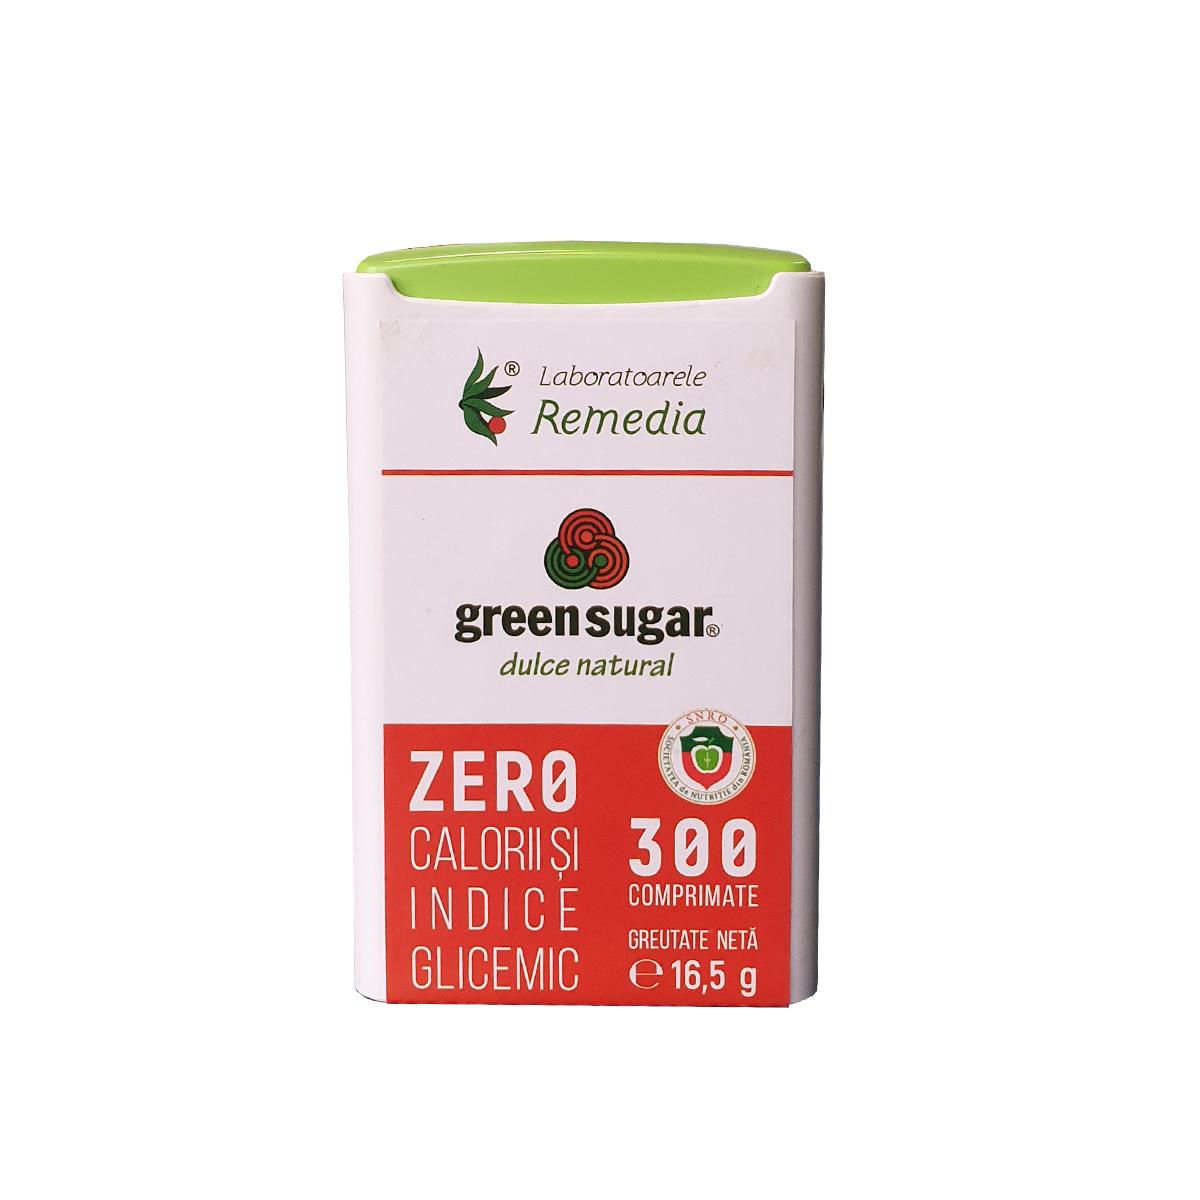 Green Sugar Dispenser, 300 comprimate, Remedia